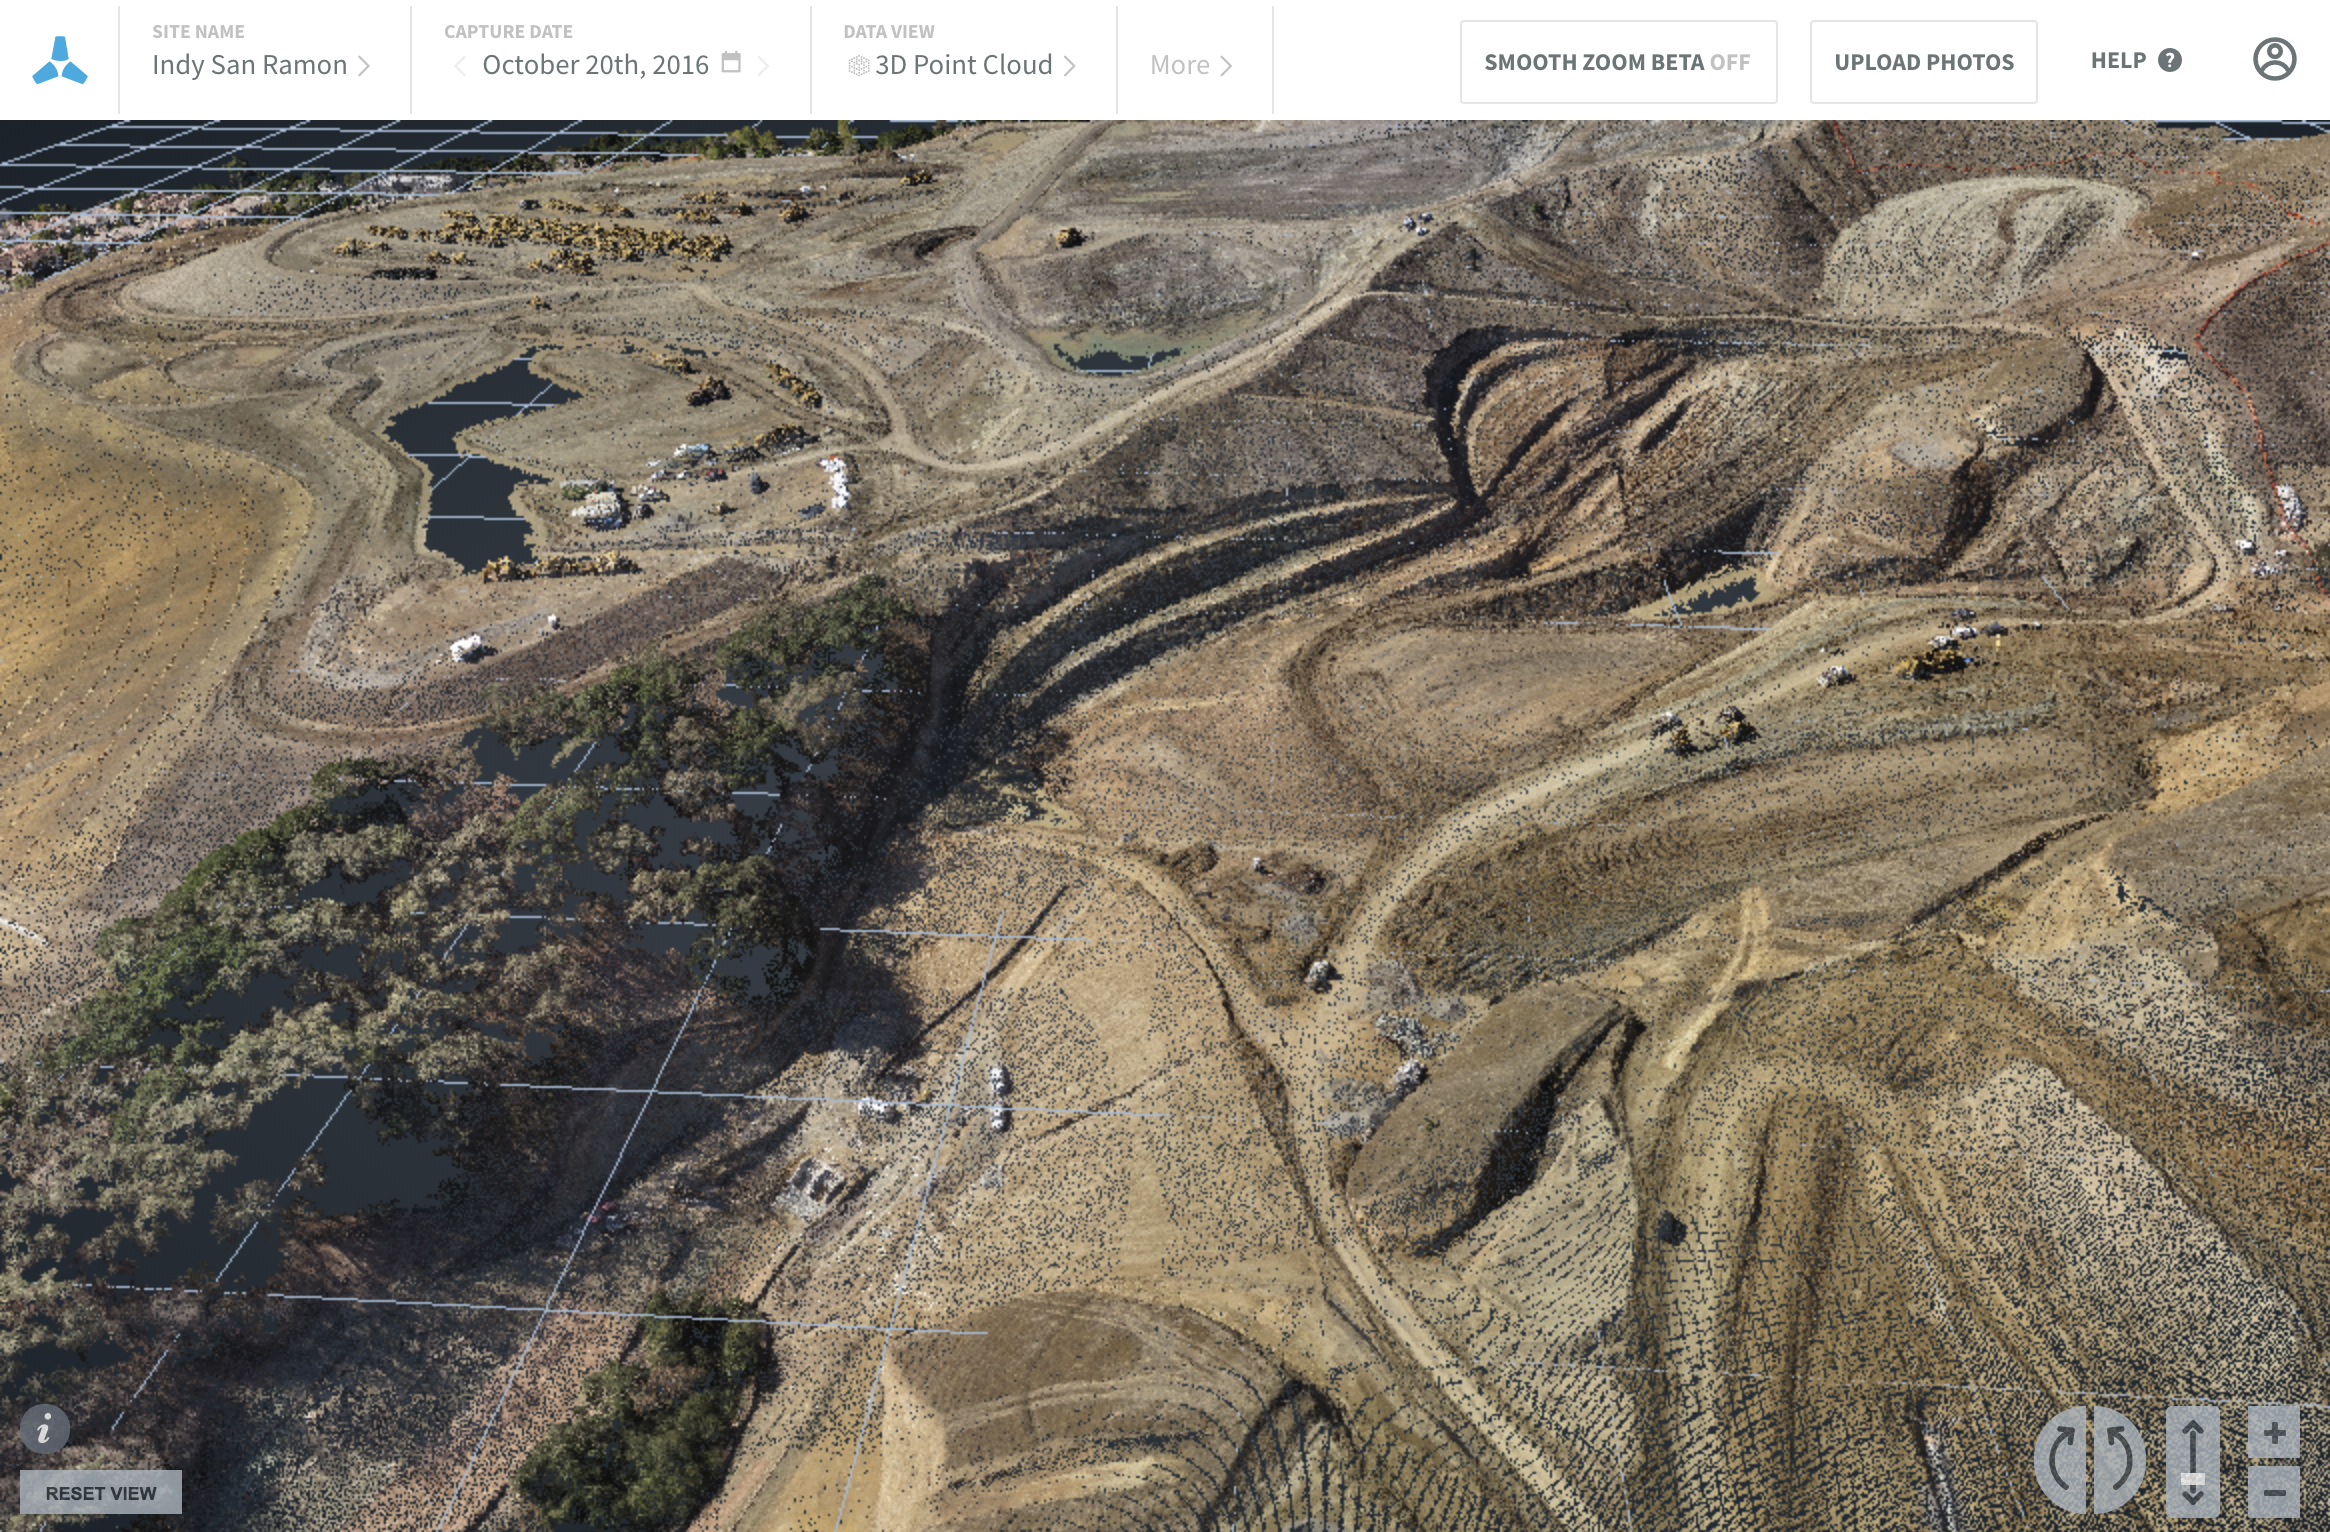 Skycatch precise topographical survey